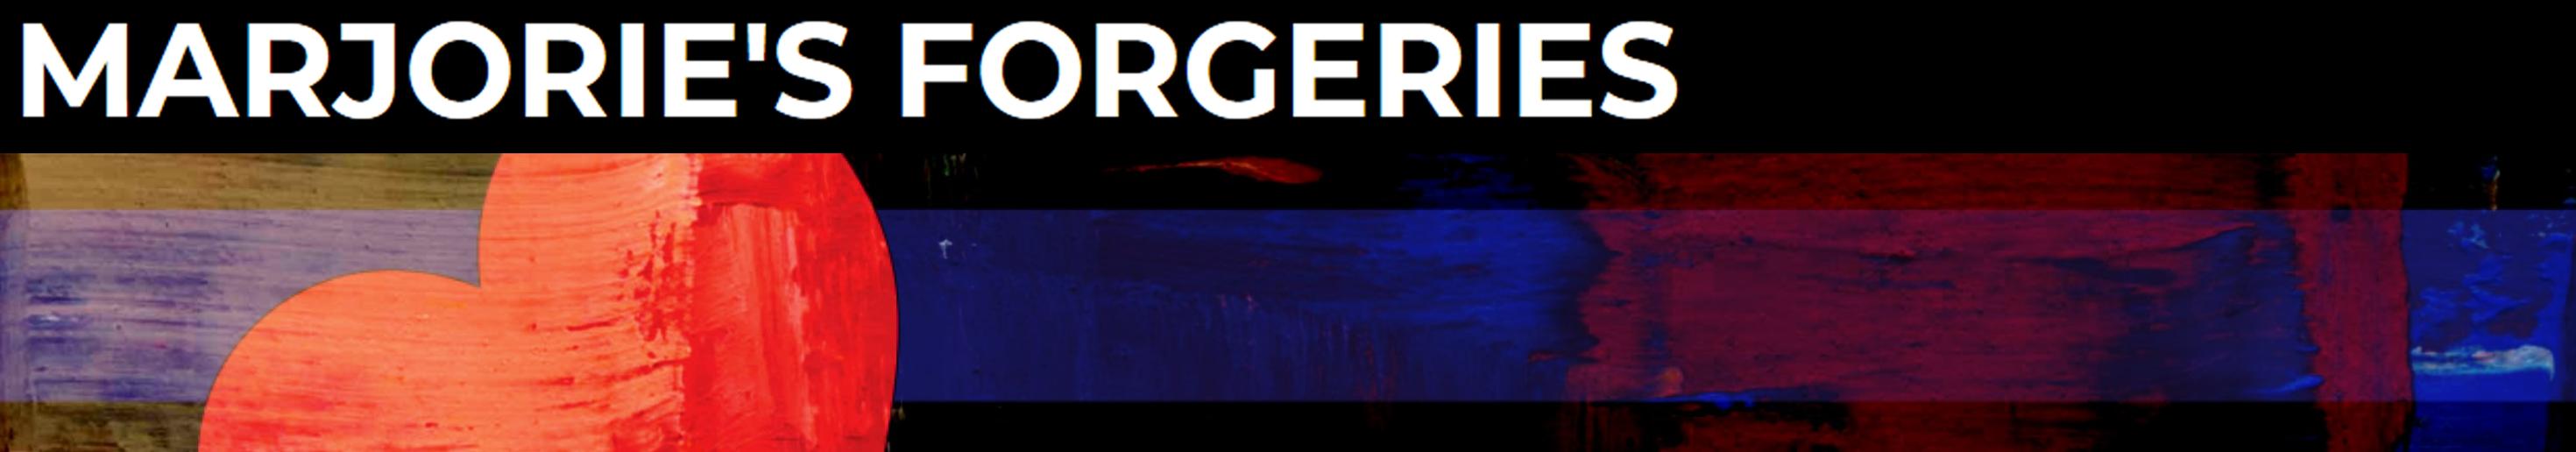 Marjorie's Forgeries